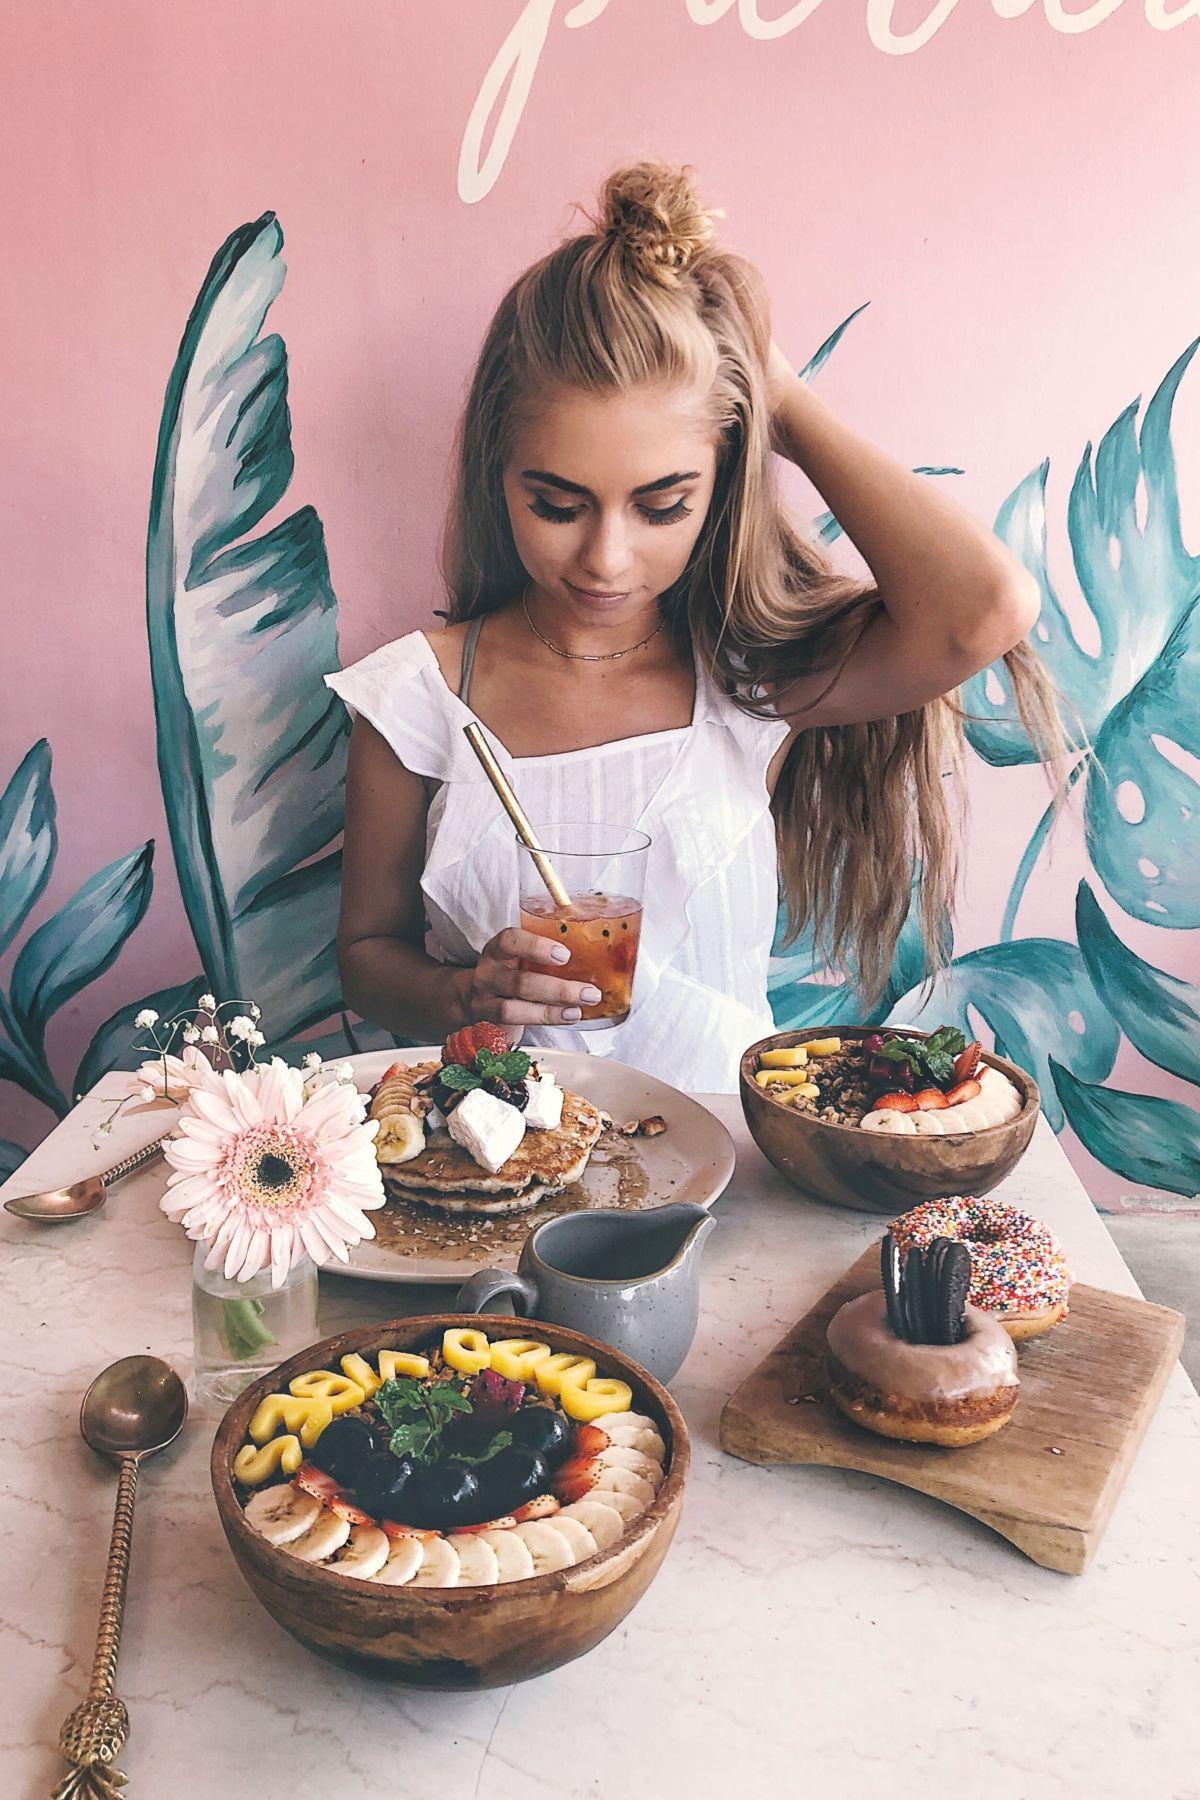 Bali Jessamaddocks Jessakae Food Cute White Top Lulus Acai Bowl Good Vibes Pink Breakfast Yum Style Fashion Blonde Hair Beauty Makeup